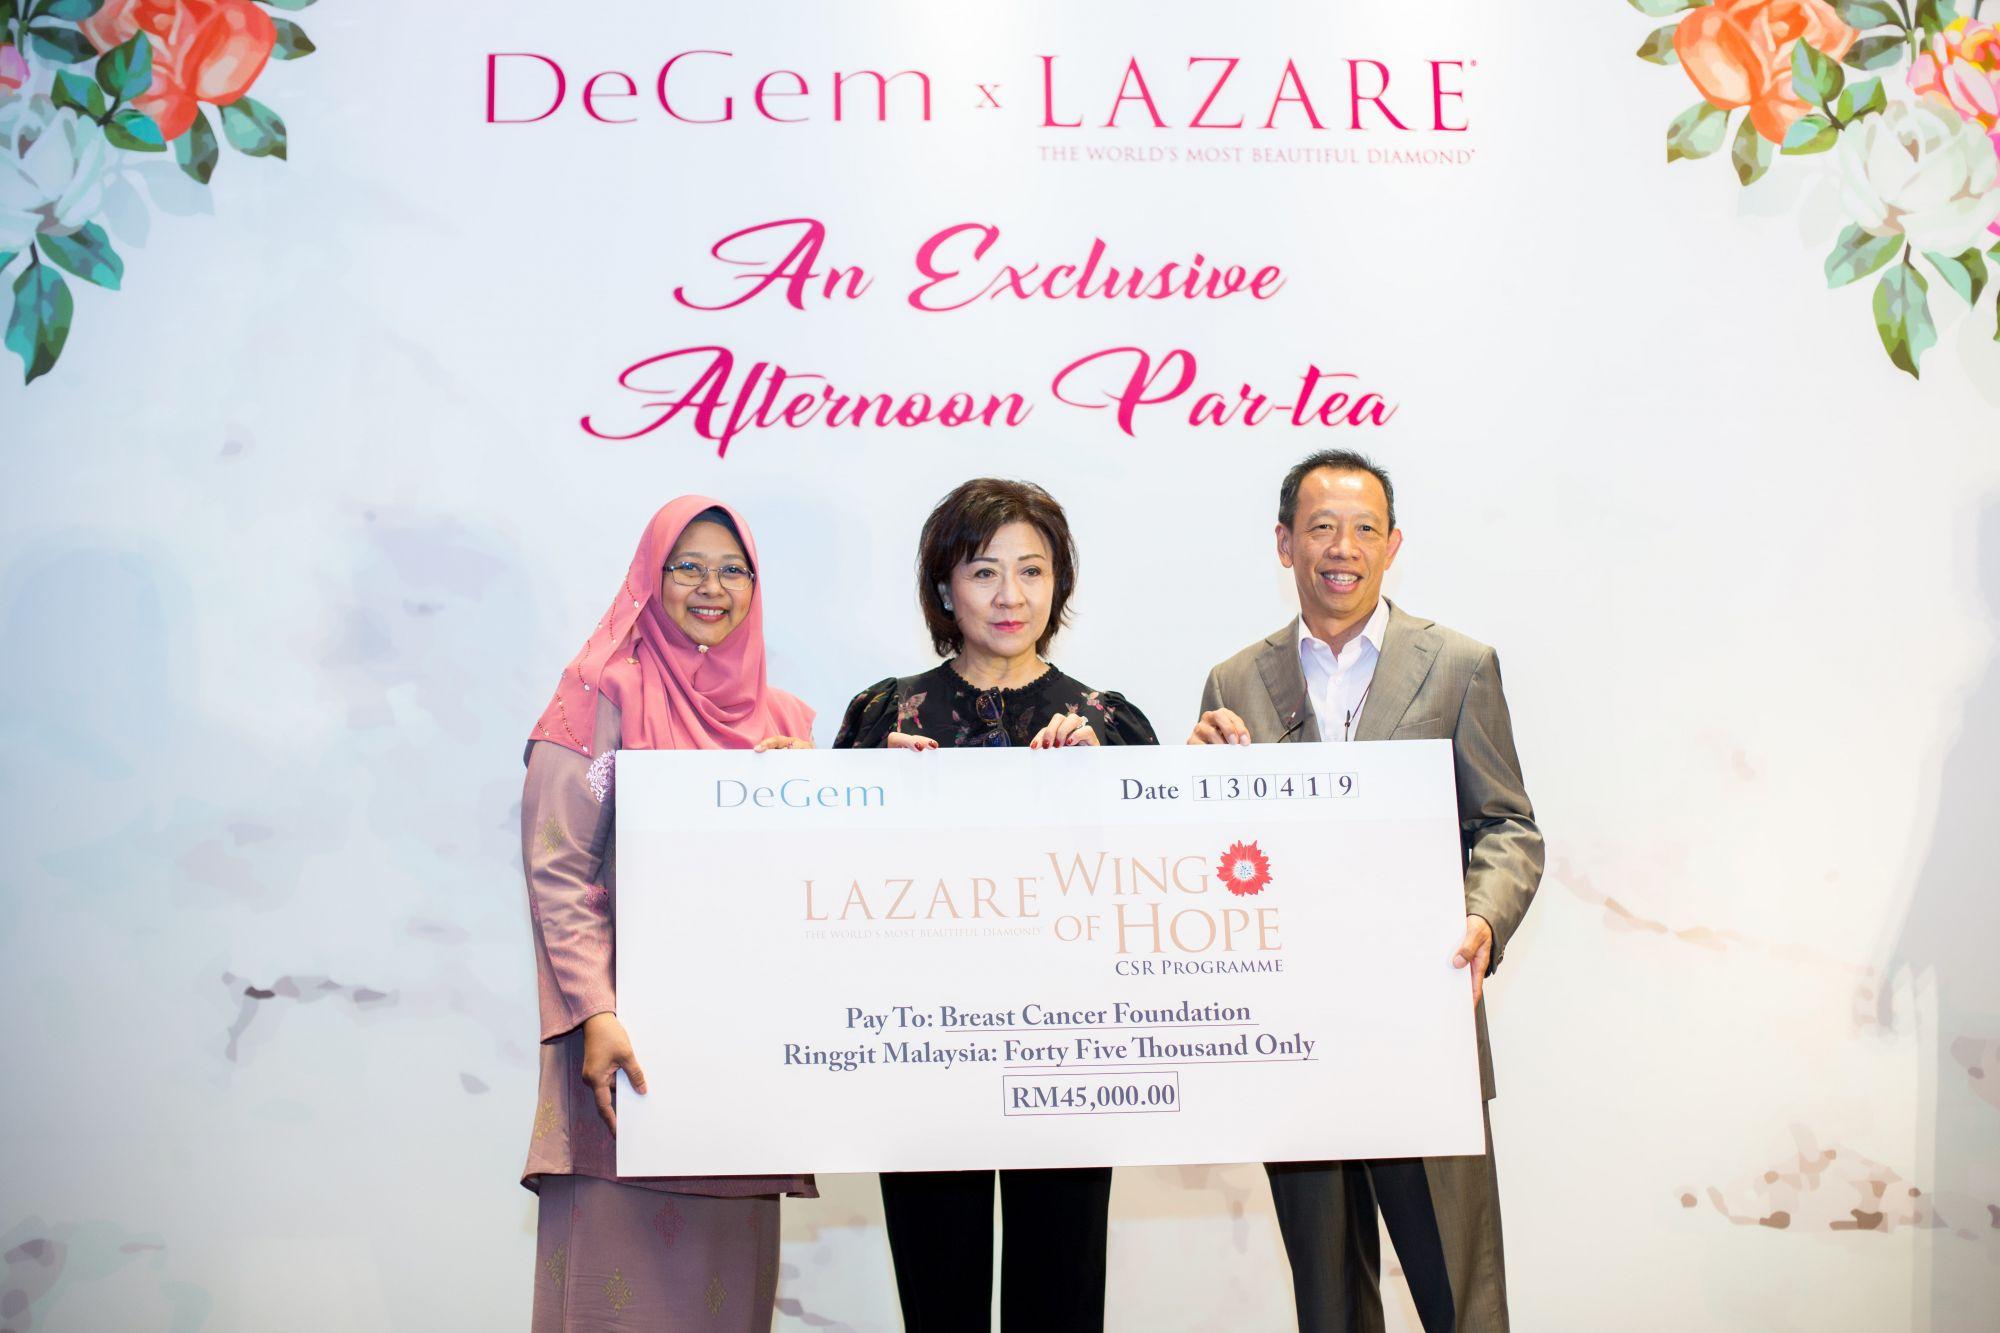 Surayati Hamzah, Laura Chow and Stephen Choong